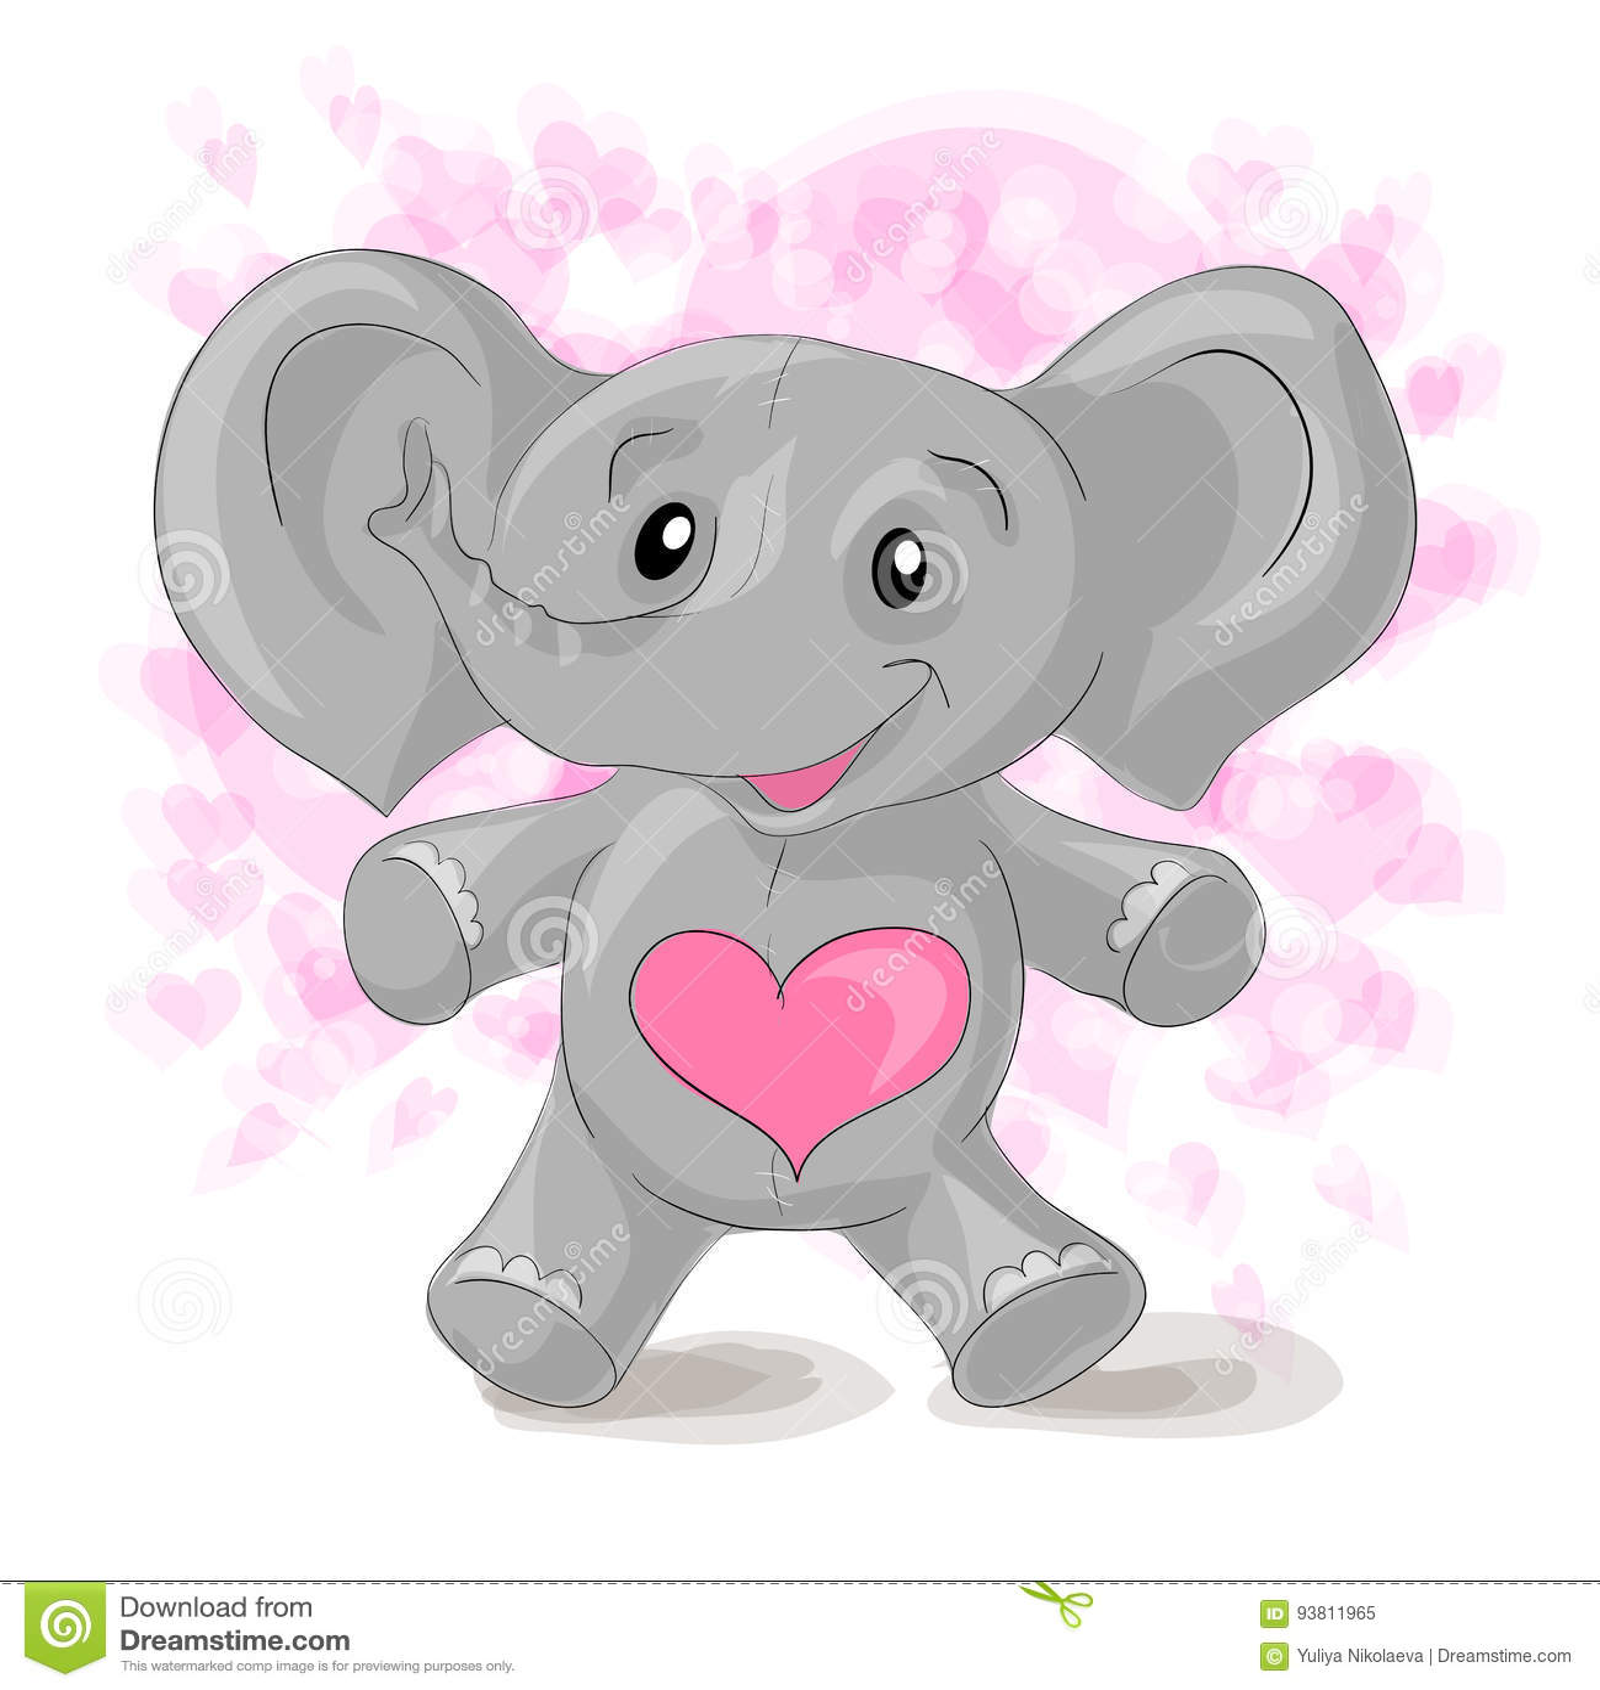 Cute cartoon elephant with hearts.